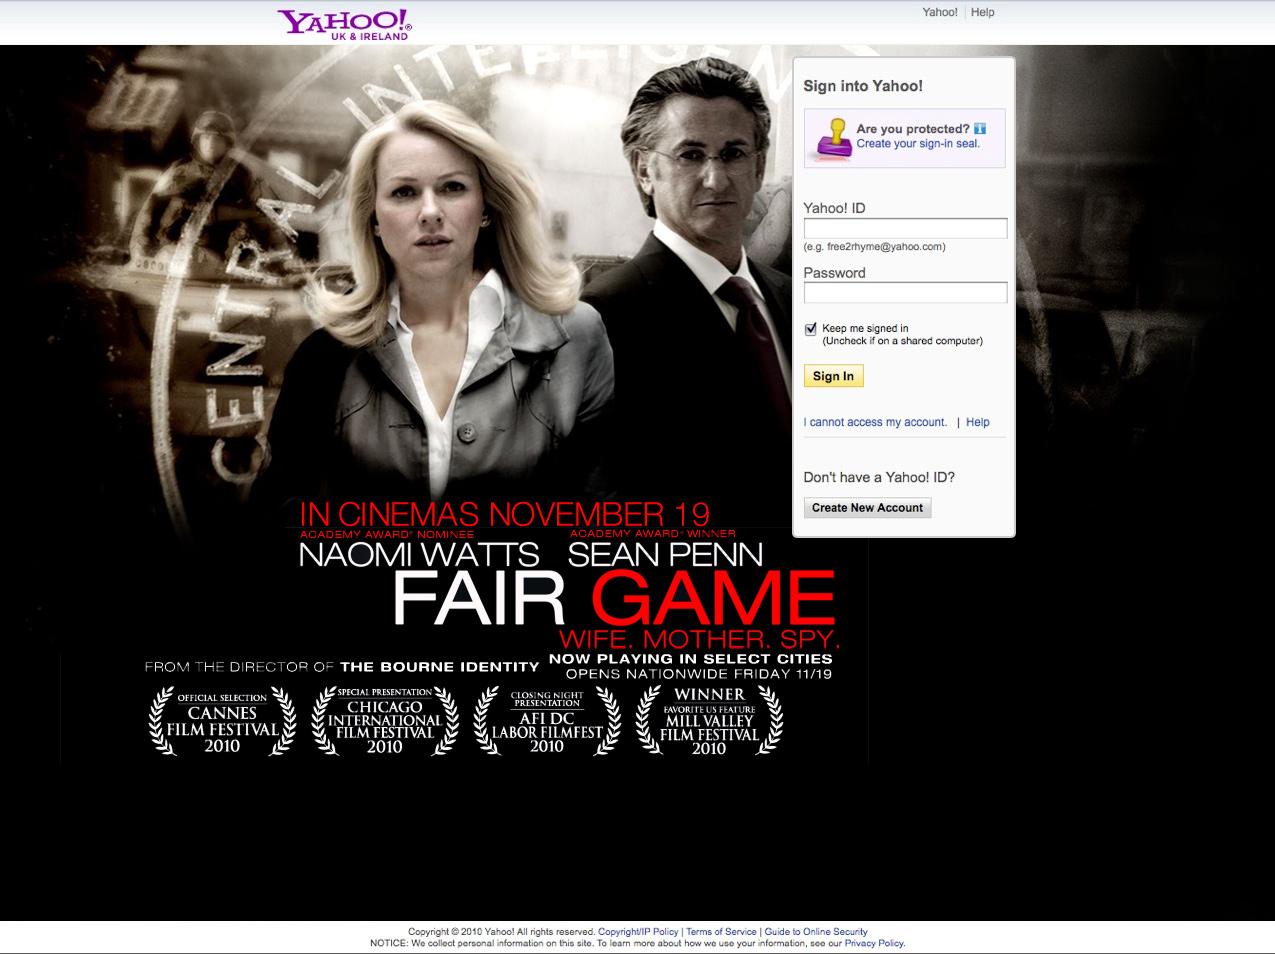 Fair Game - Login Ad - Advertising - Website Development Farnborough, Hampshire